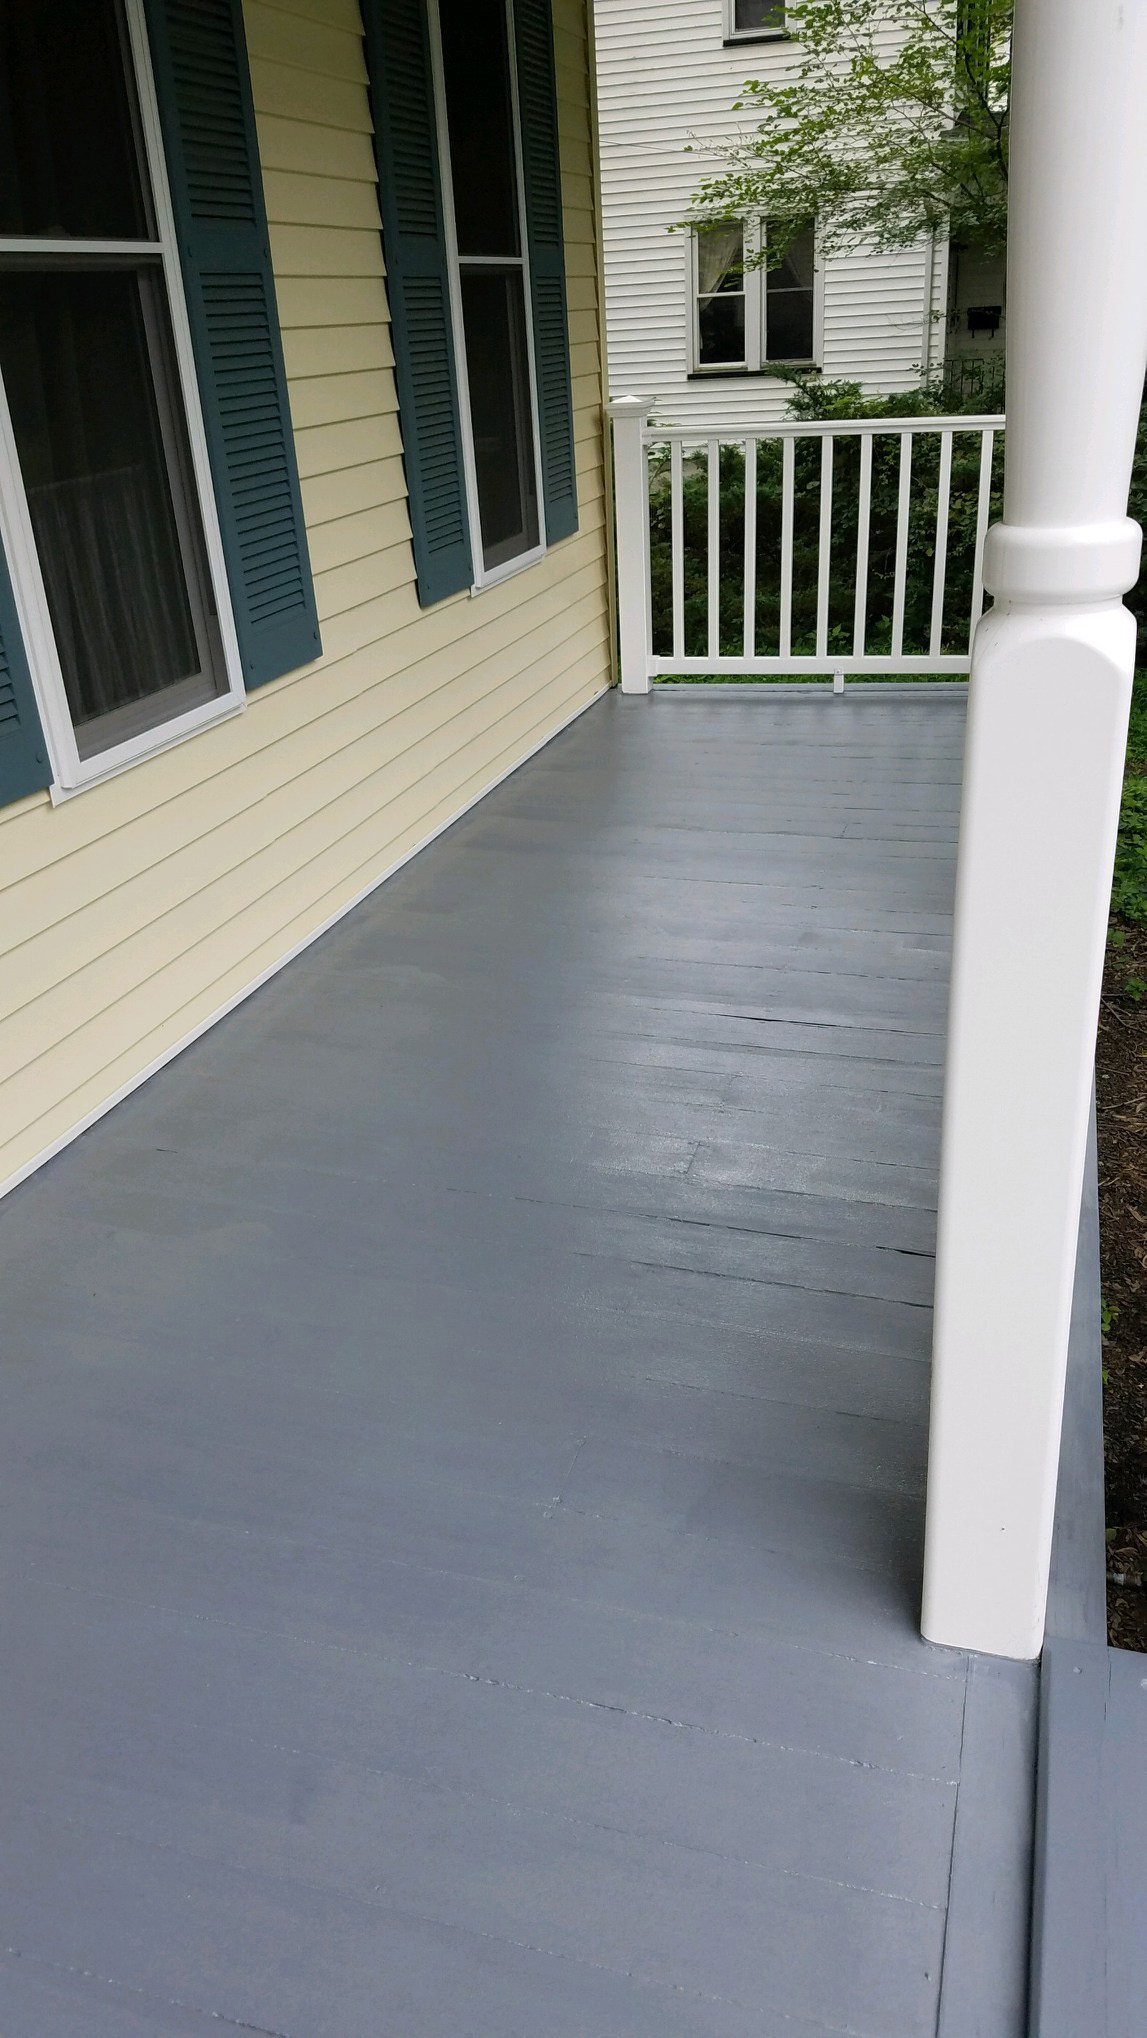 vintage-painting-deck-before-2nd-primer